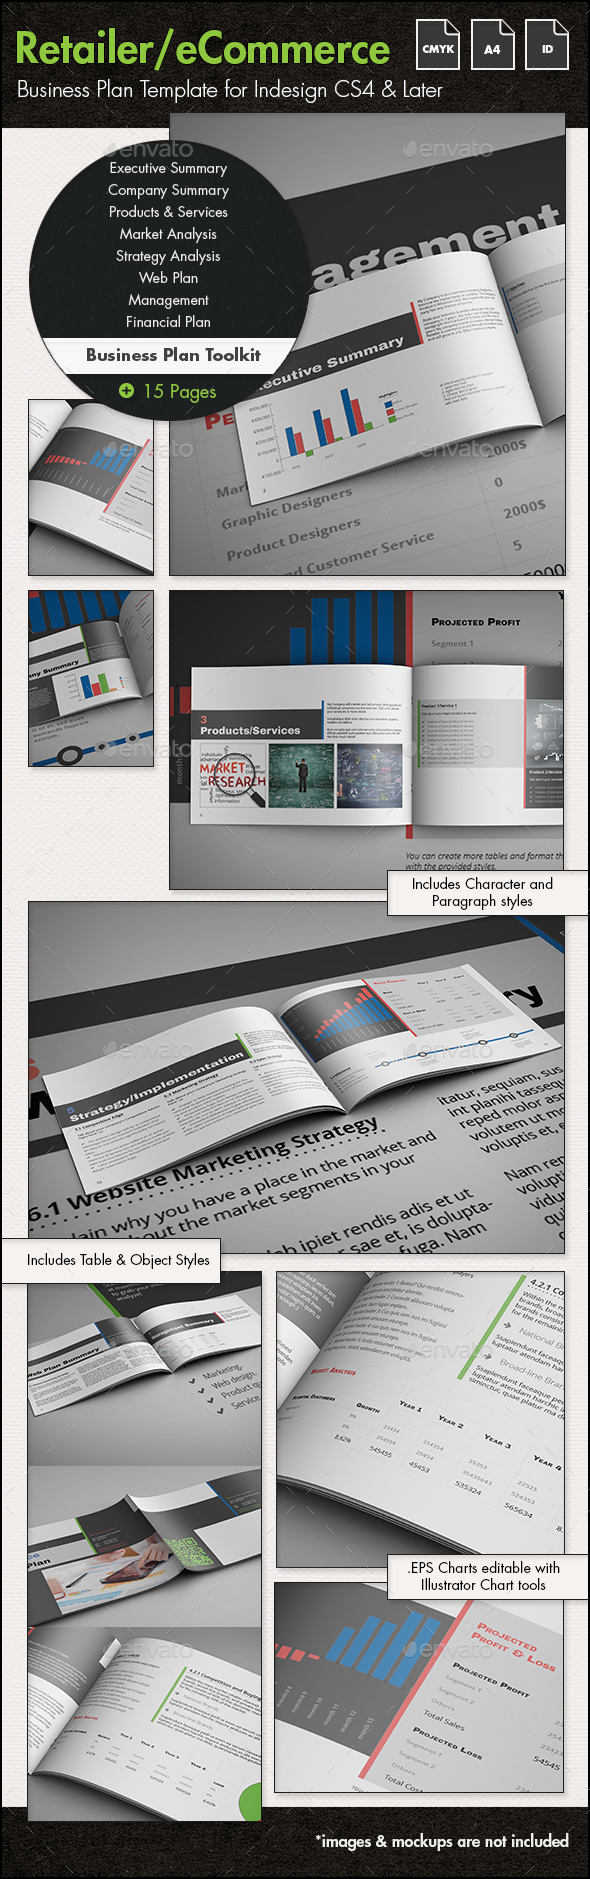 eCommerce/Retailer Business Plan Toolkit - A4 - Informational Brochures